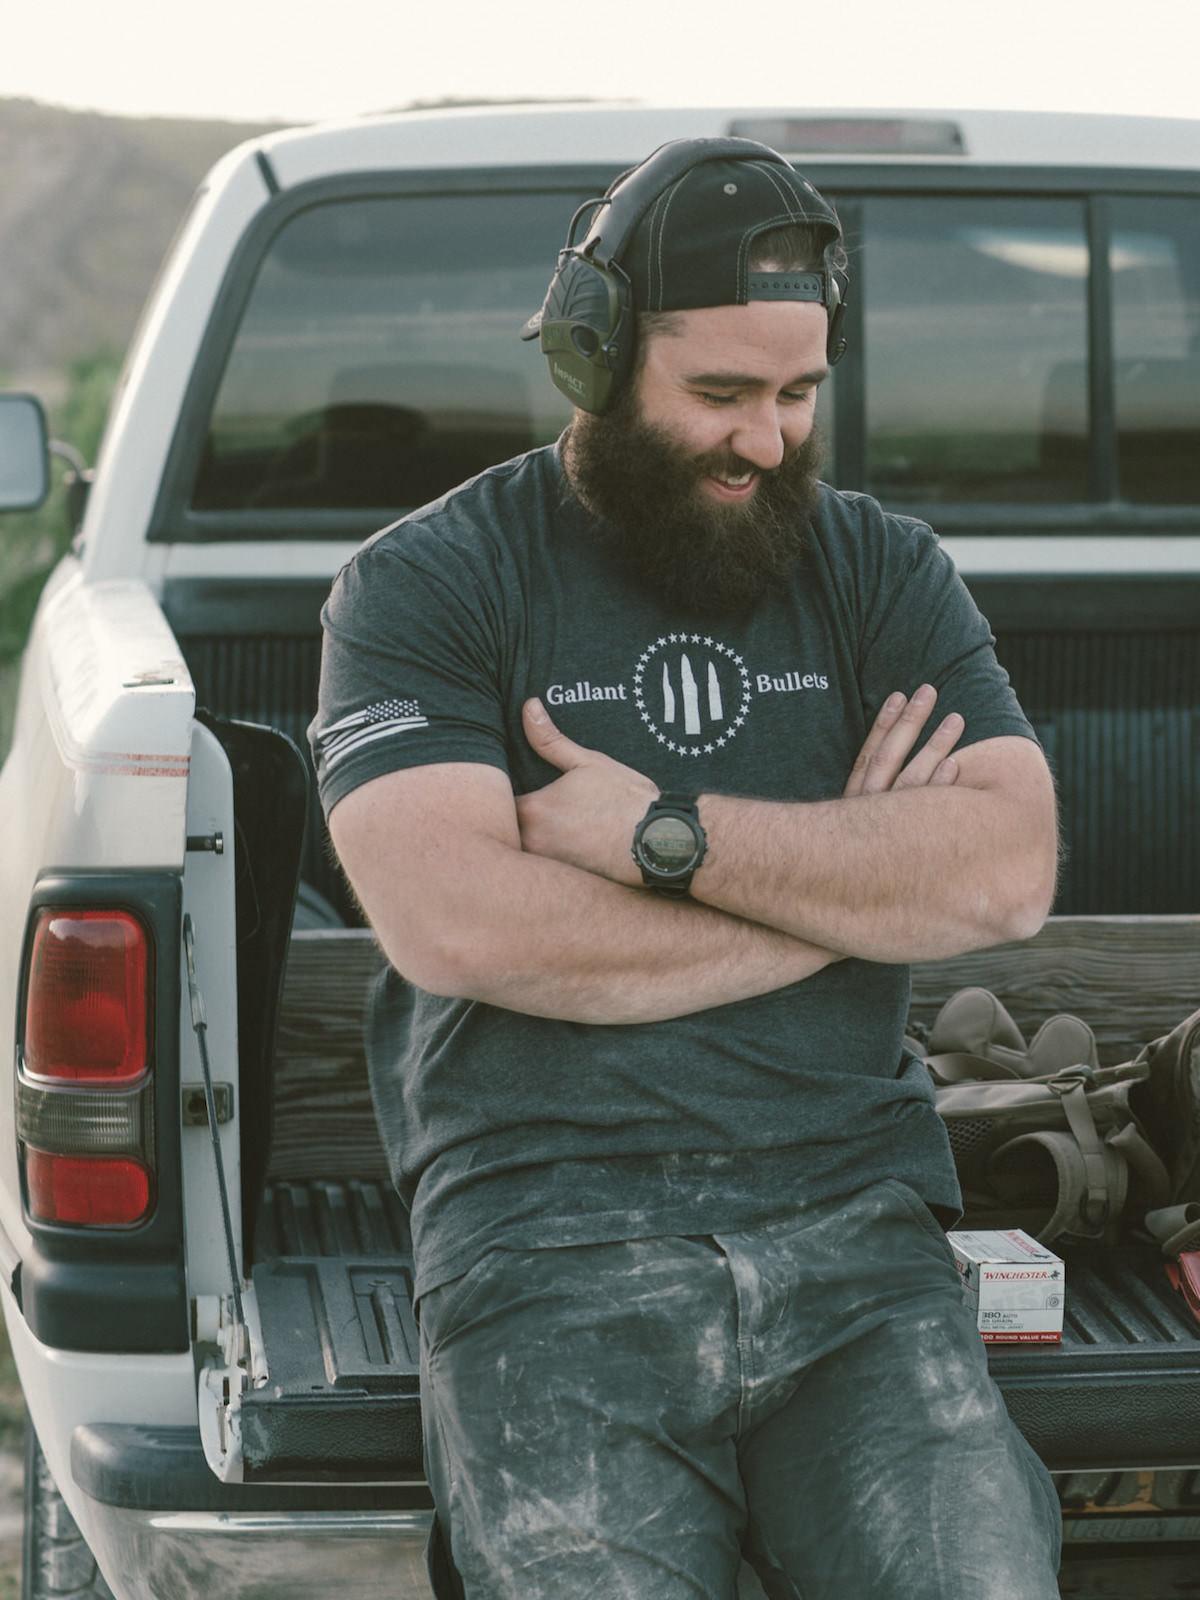 GALLANT BULLETS MEN'S FIRST ORIGINAL T-SHIRT